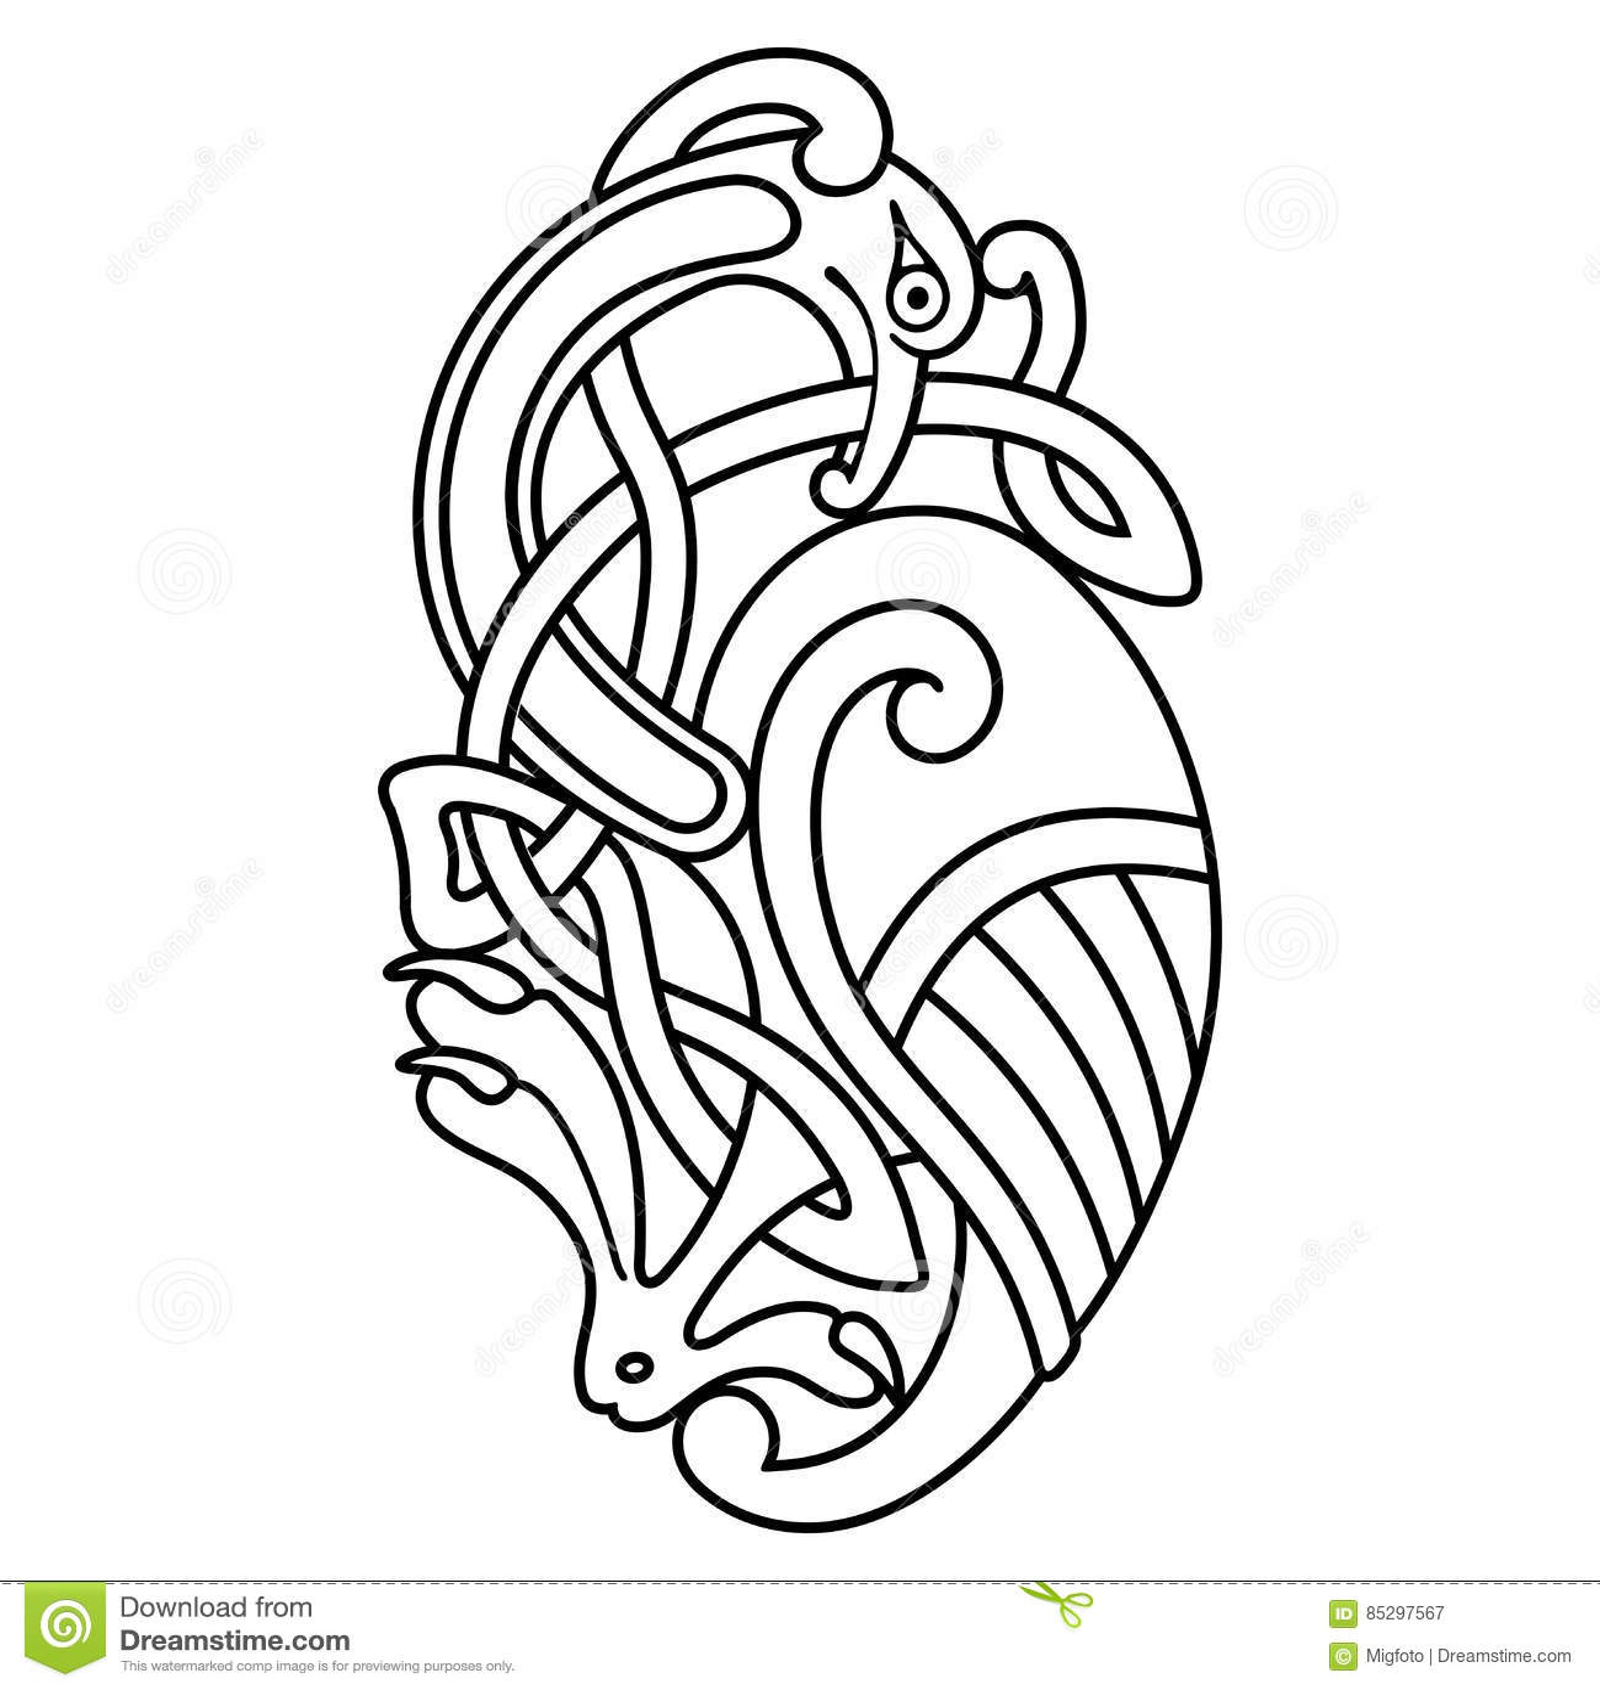 Dessin Celtique dessin national celtique illustration de vecteur. illustration du